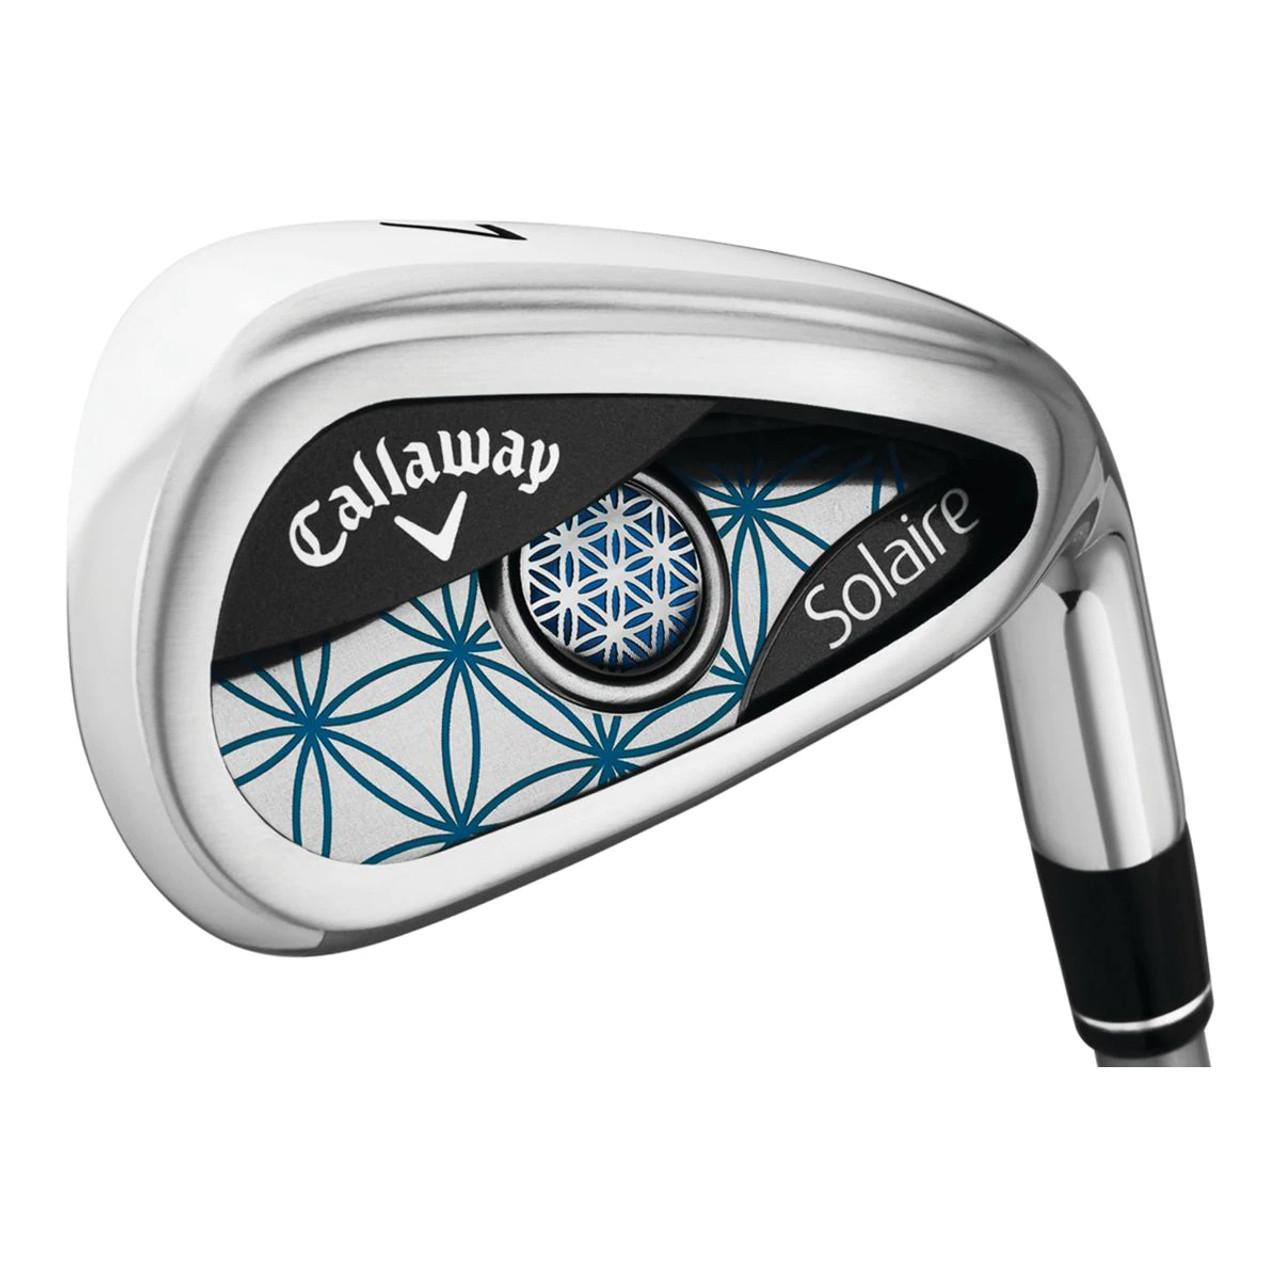 Callaway Womens Solaire 11 Piece Golf Niagara Blue Iron